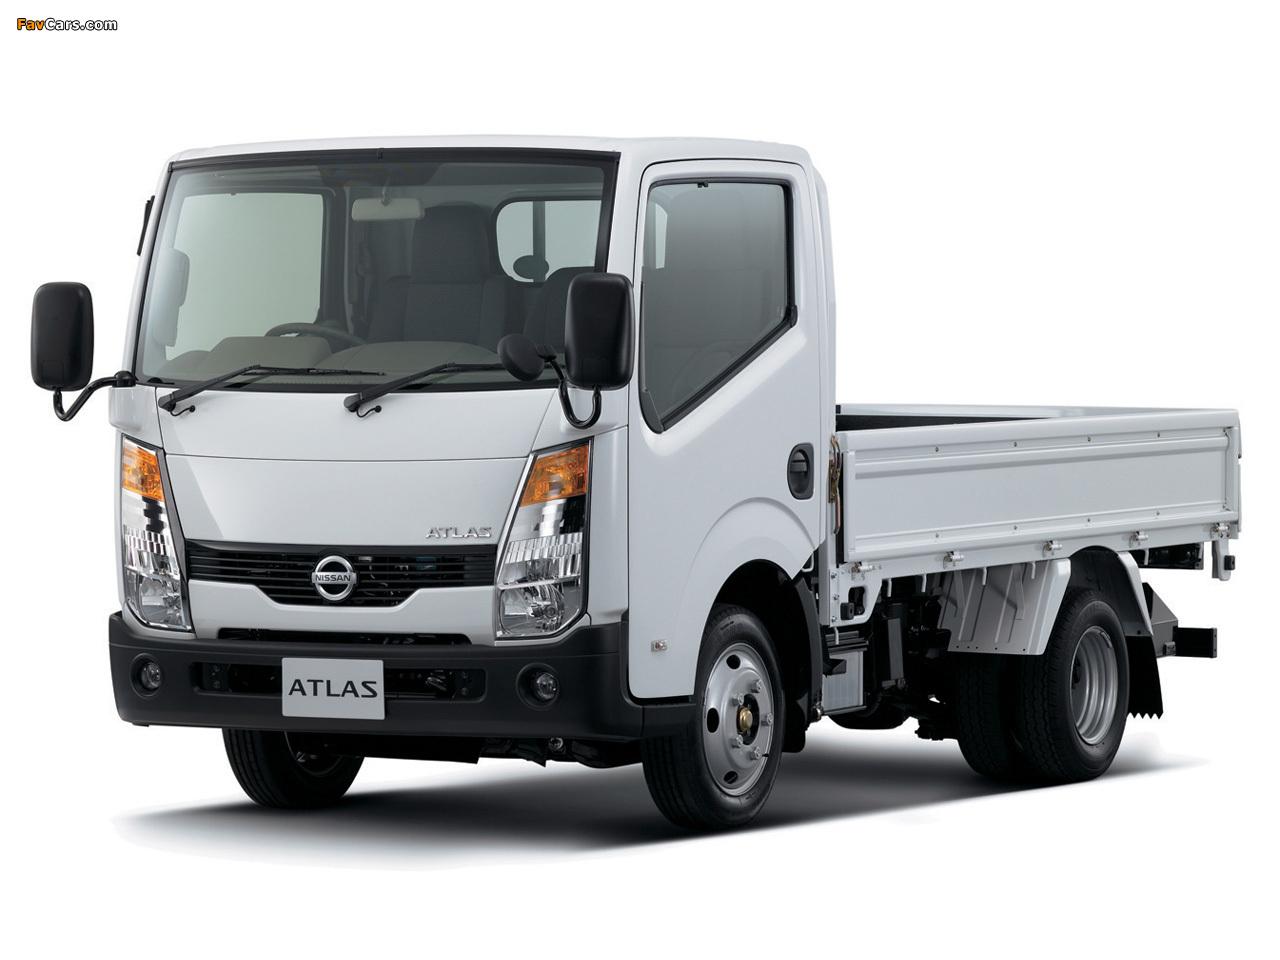 Nissan Atlas (F24) 2007 photos (1280 x 960)